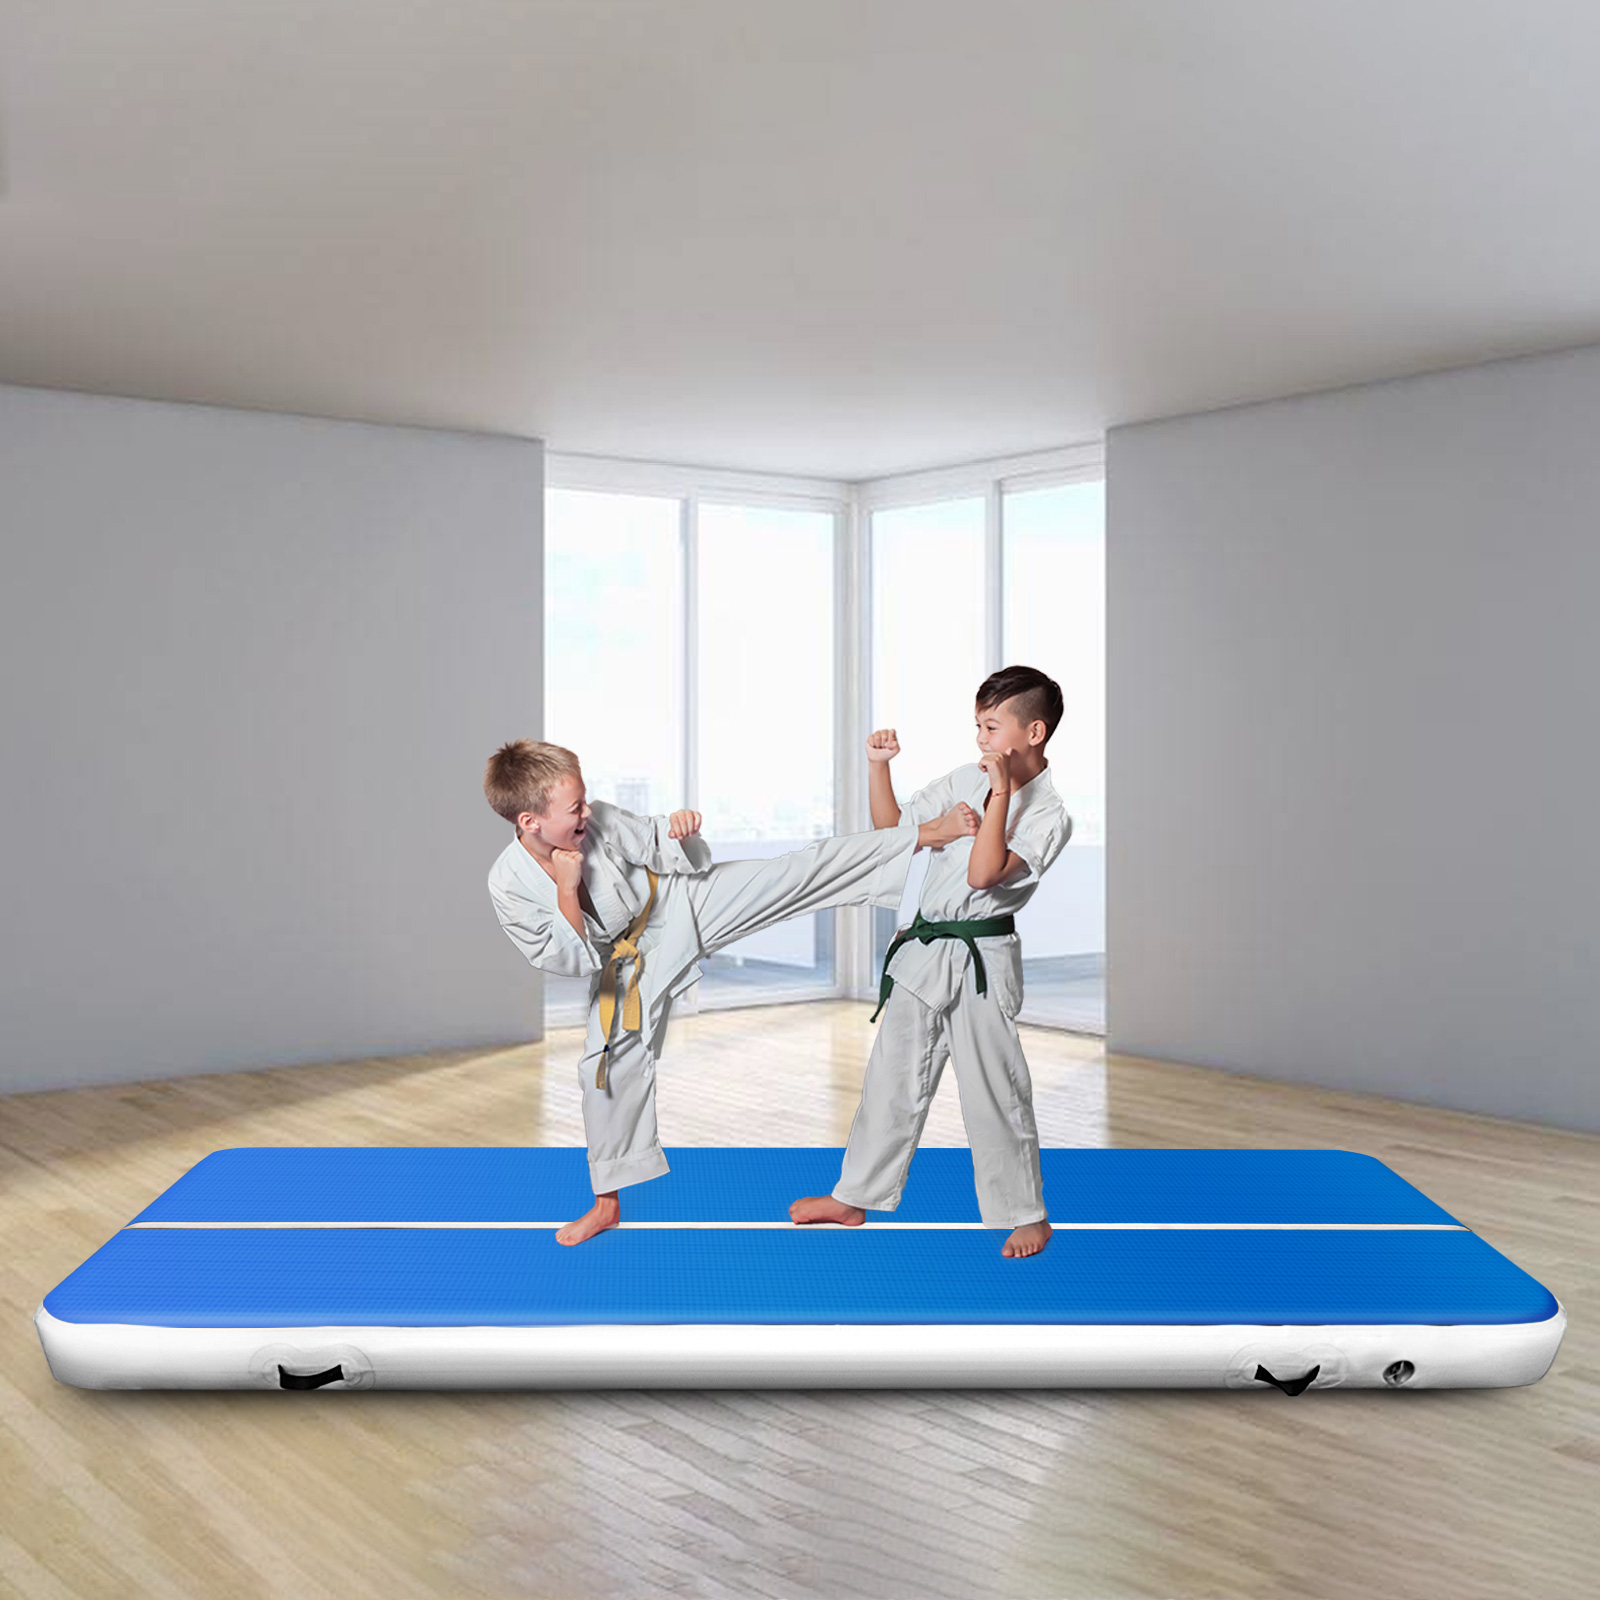 aufblasbar air track floor tumbling gymnastikmatte fitess